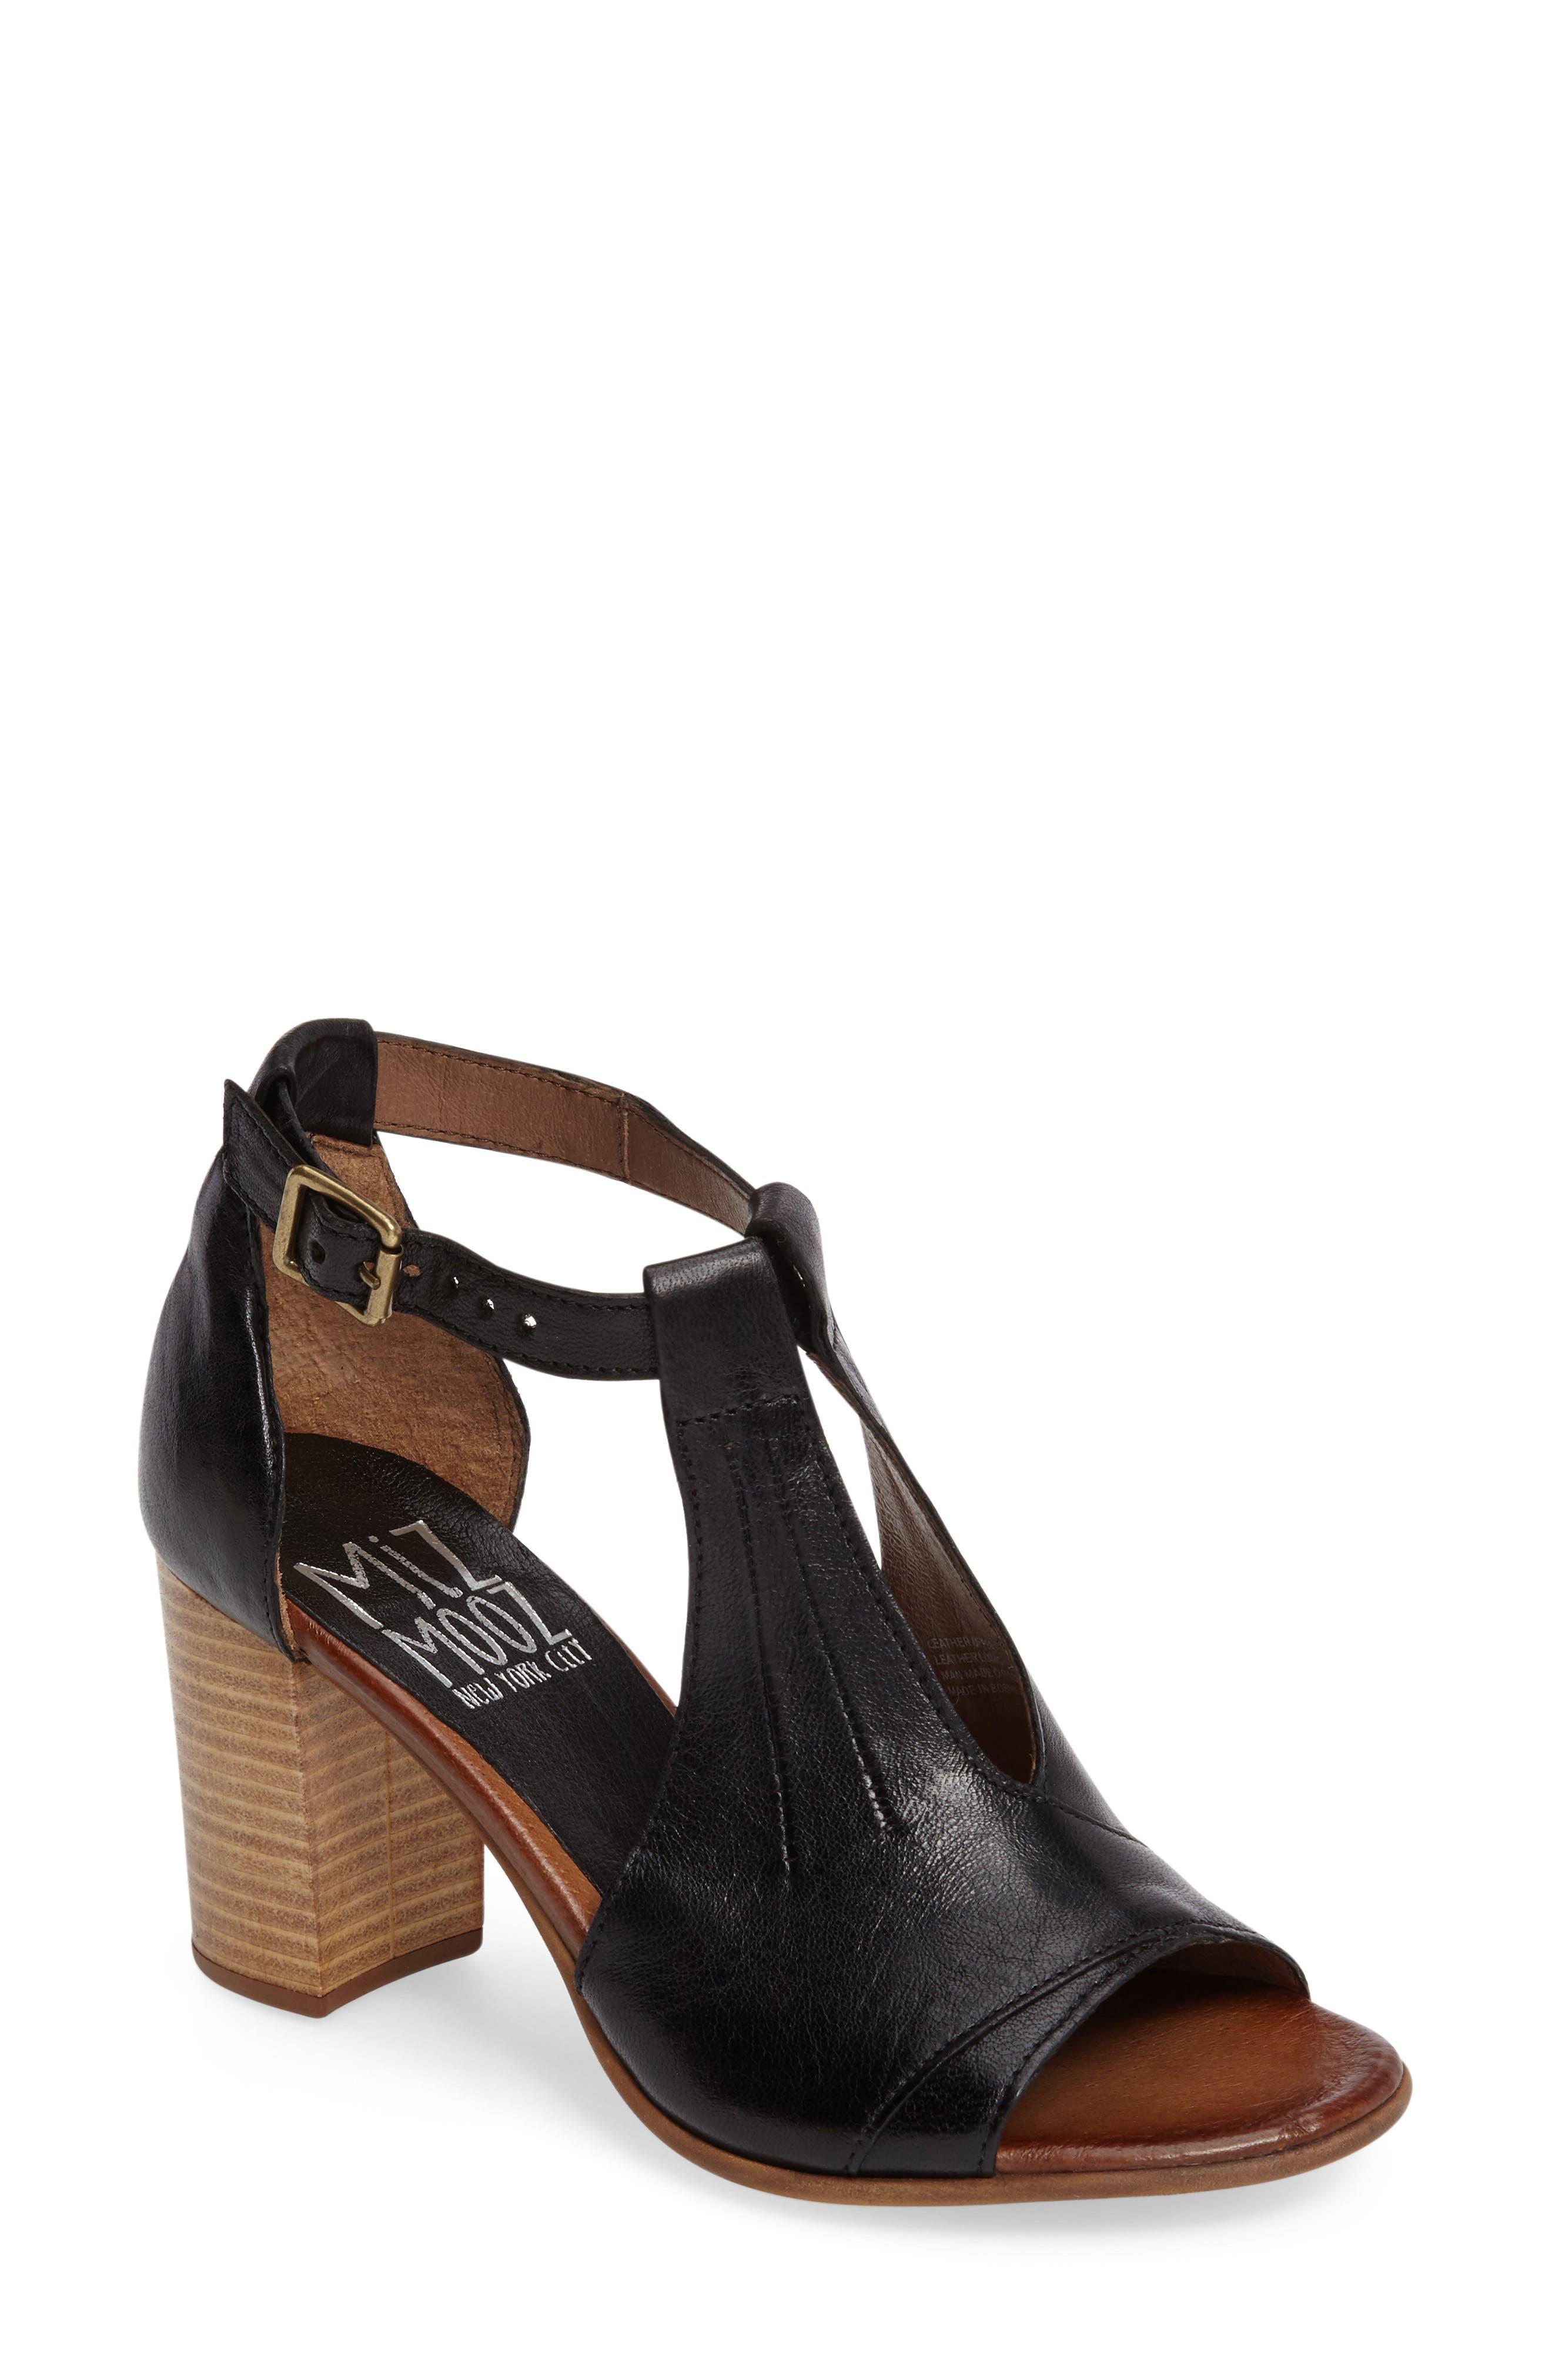 Alternate Image 1 Selected - Miz Mooz Savannah T-Strap Strap Sandal (Women)